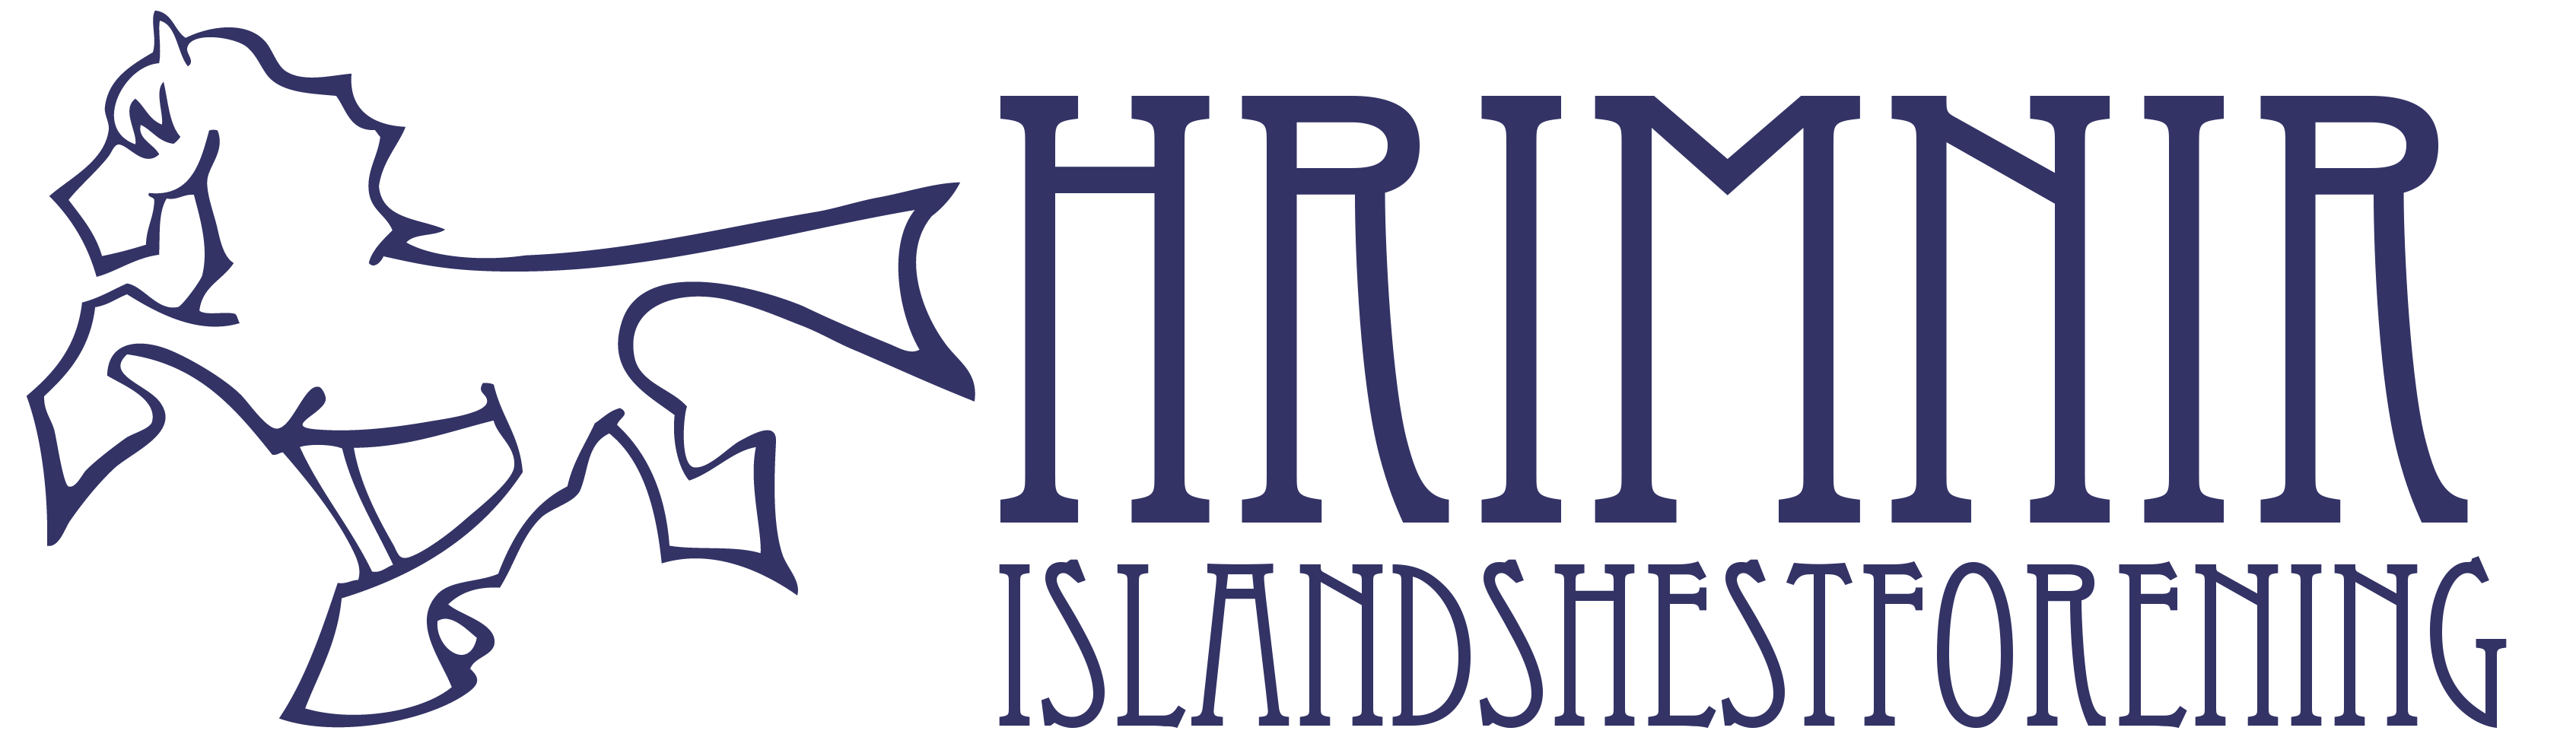 Hrimnir Islandshestforening